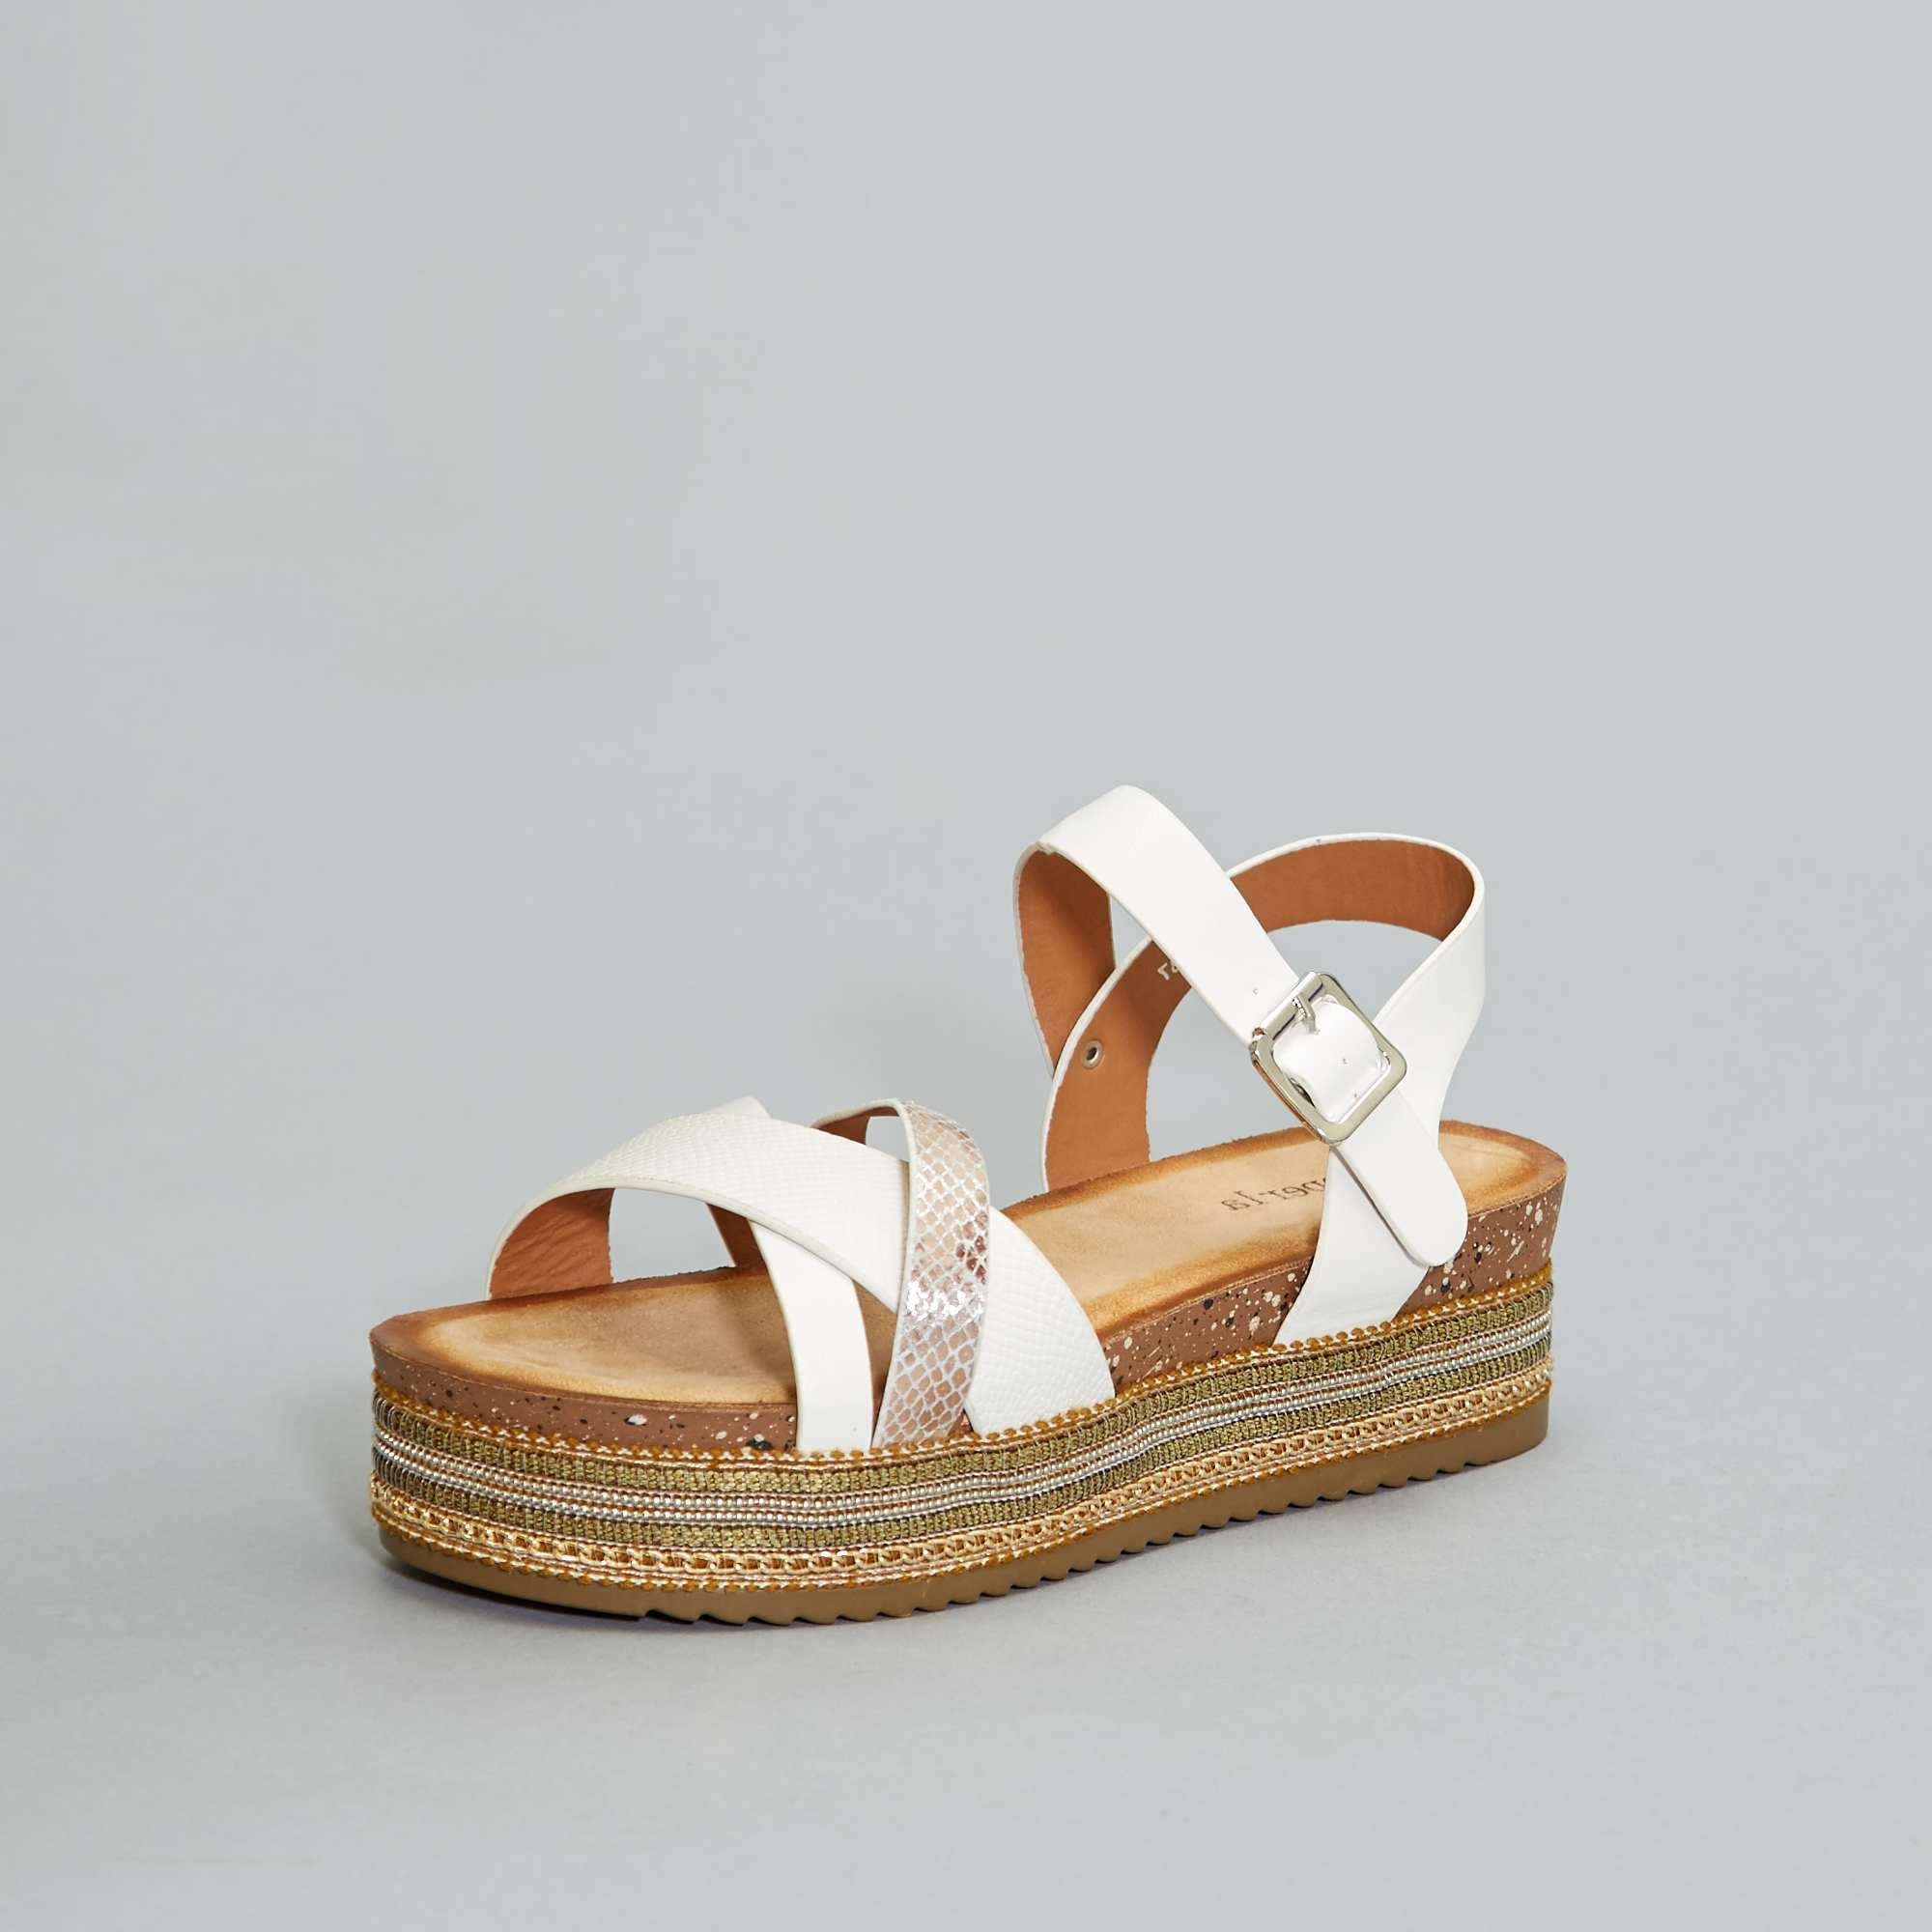 3cb937a7f6121a Sandales compensées Femme - blanc - Kiabi - 22,00€